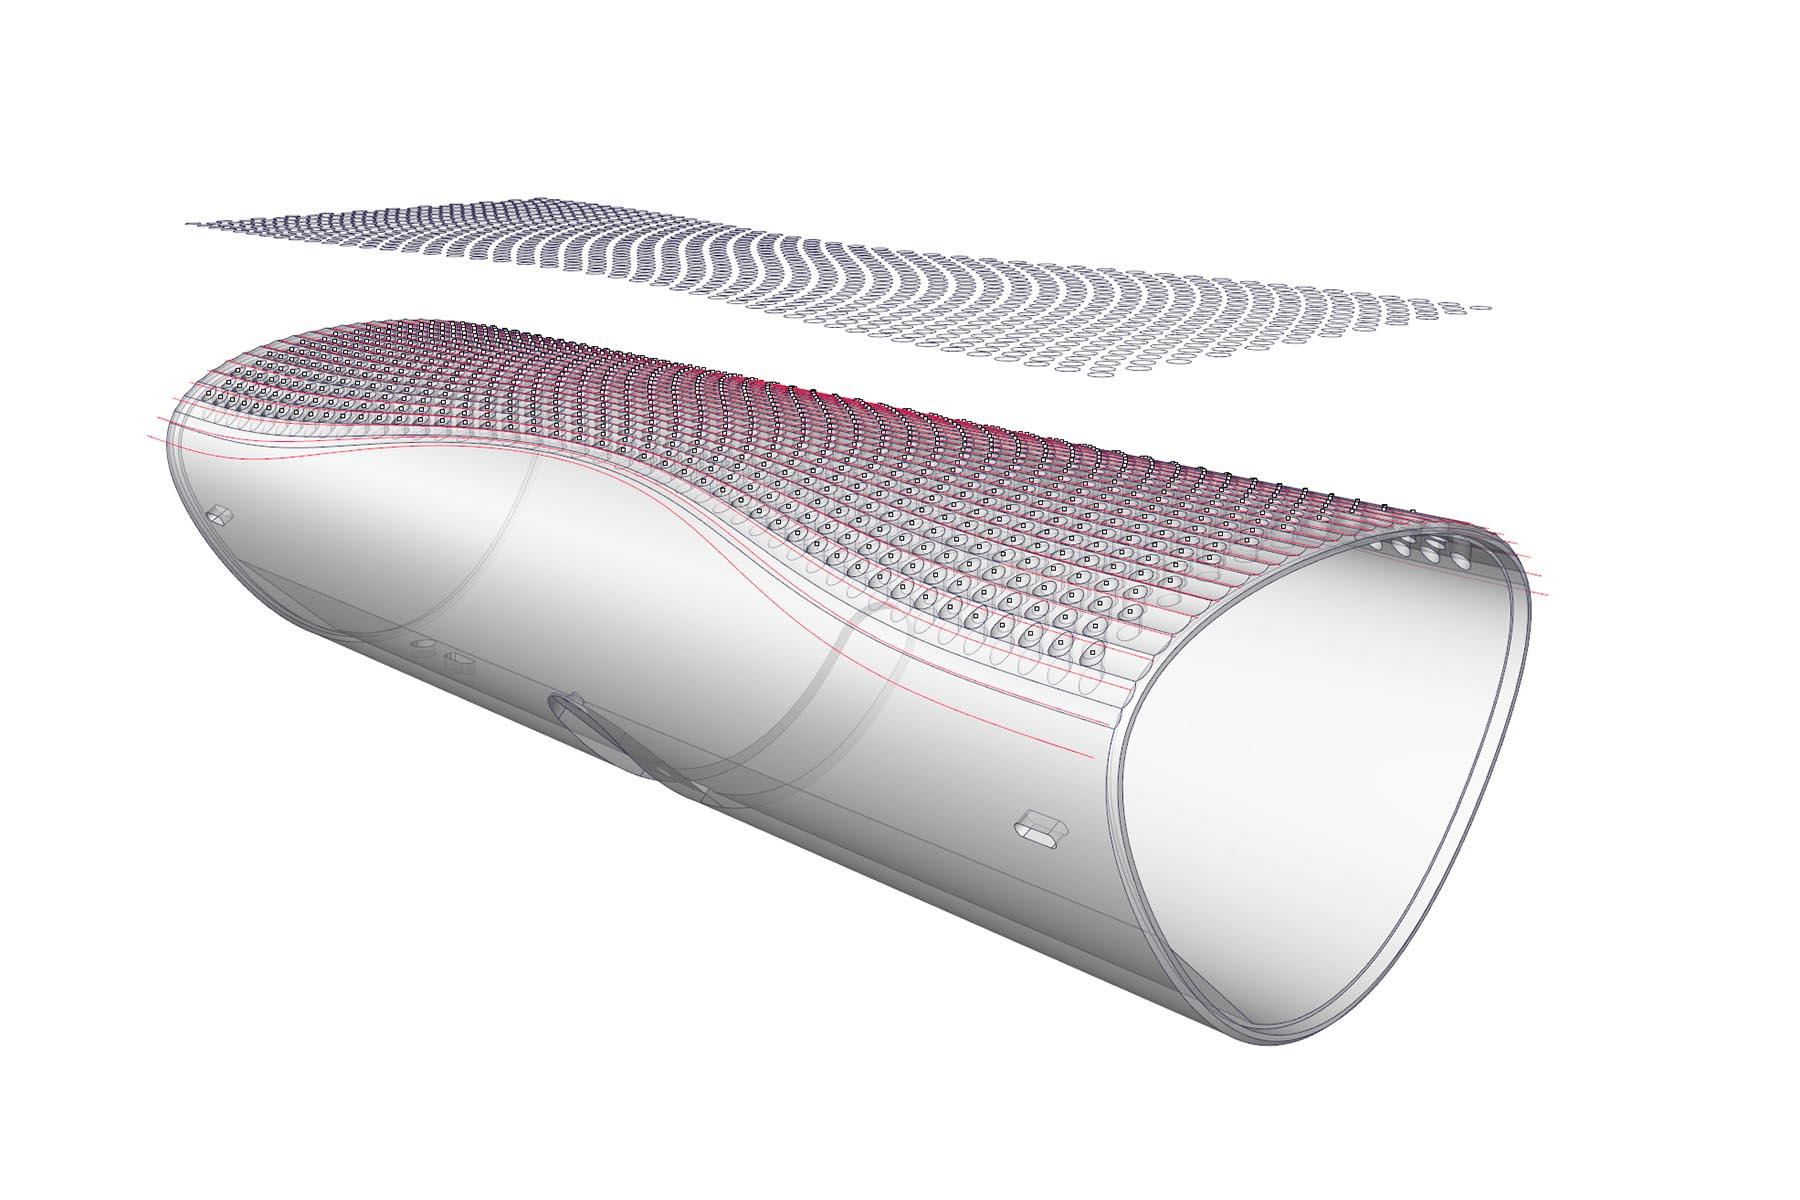 kef-muo-speaker-ross-lovegrove-computational-design-andrea-locatelli-02.jpg